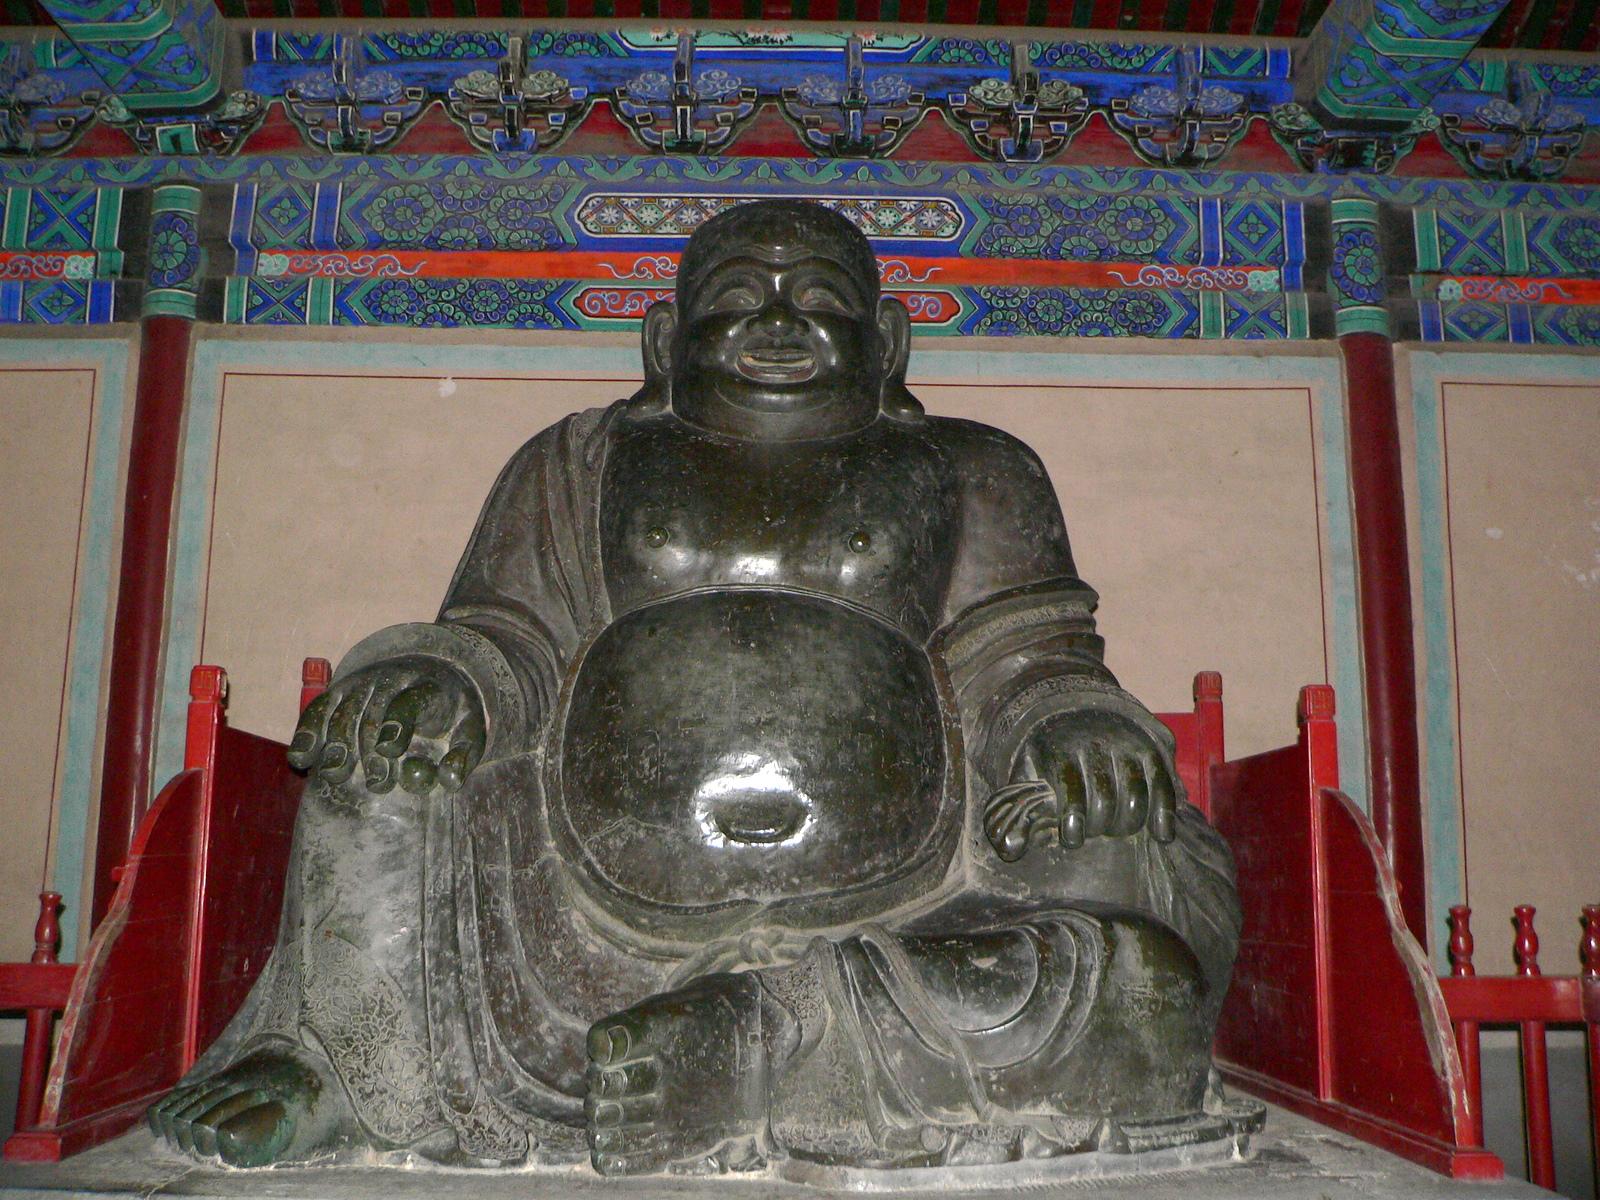 Budai Statue